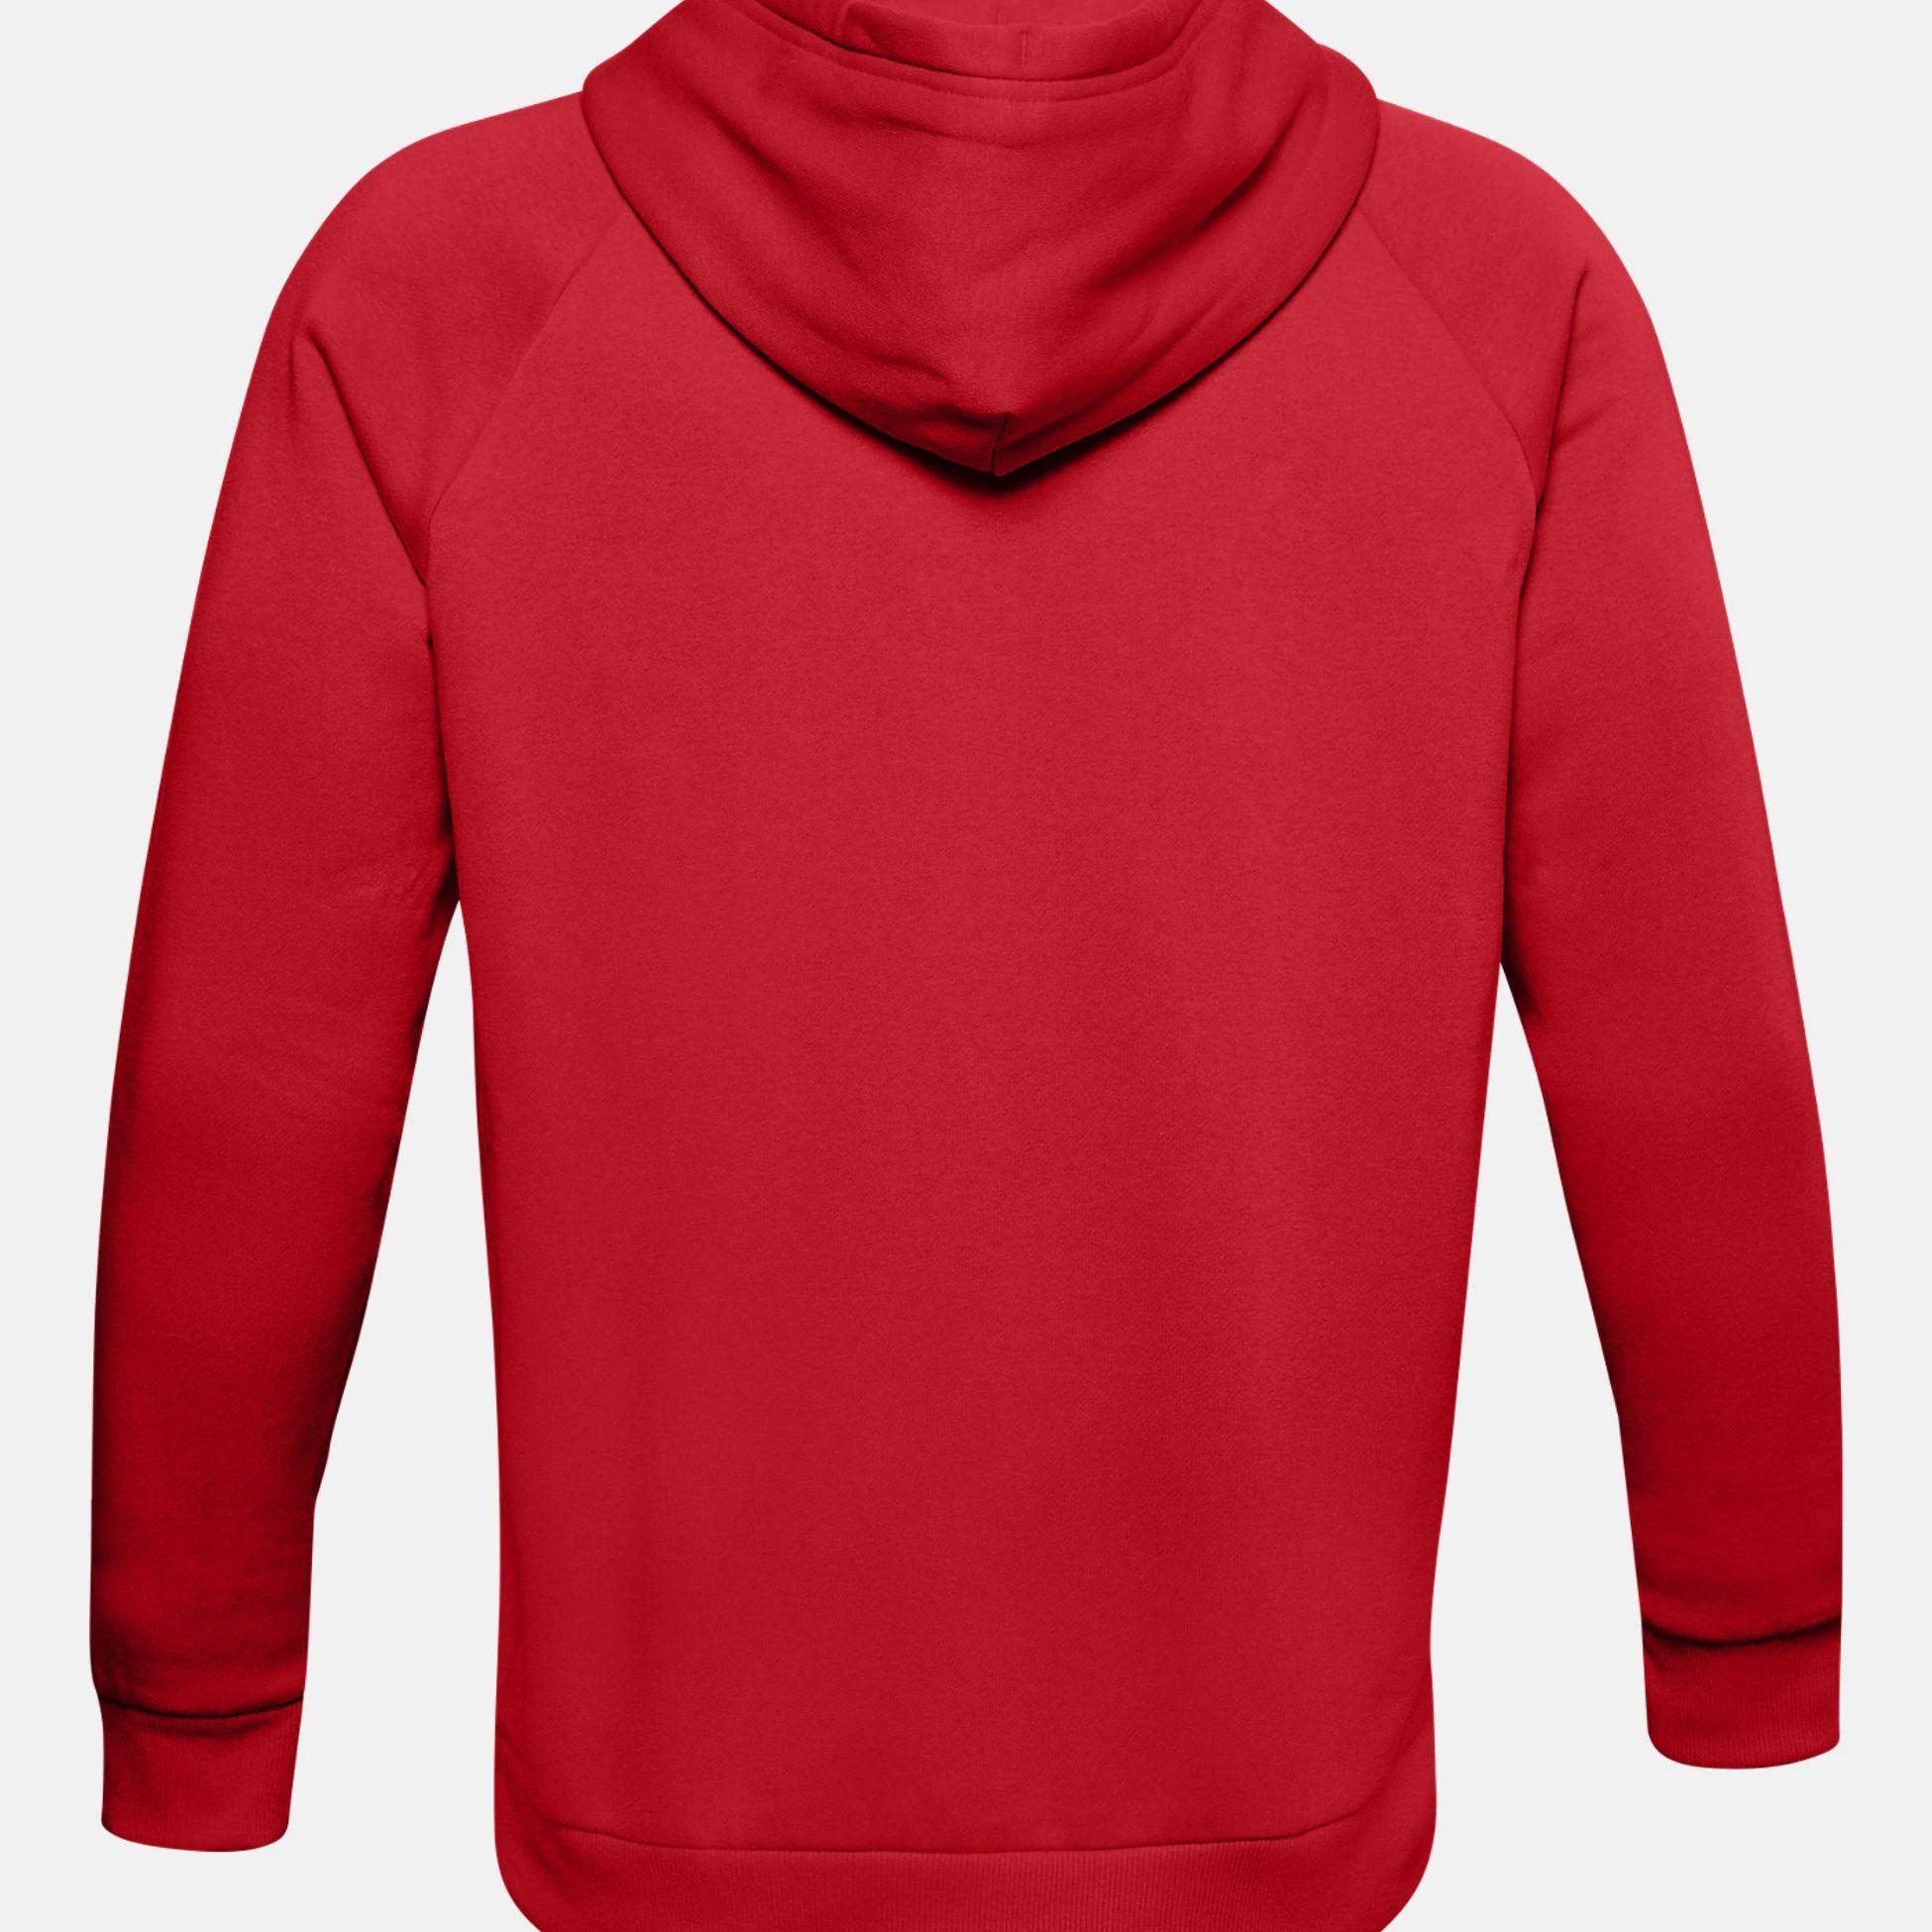 Clothing -  under armour Rival Fleece Big Logo Hoodie 7093